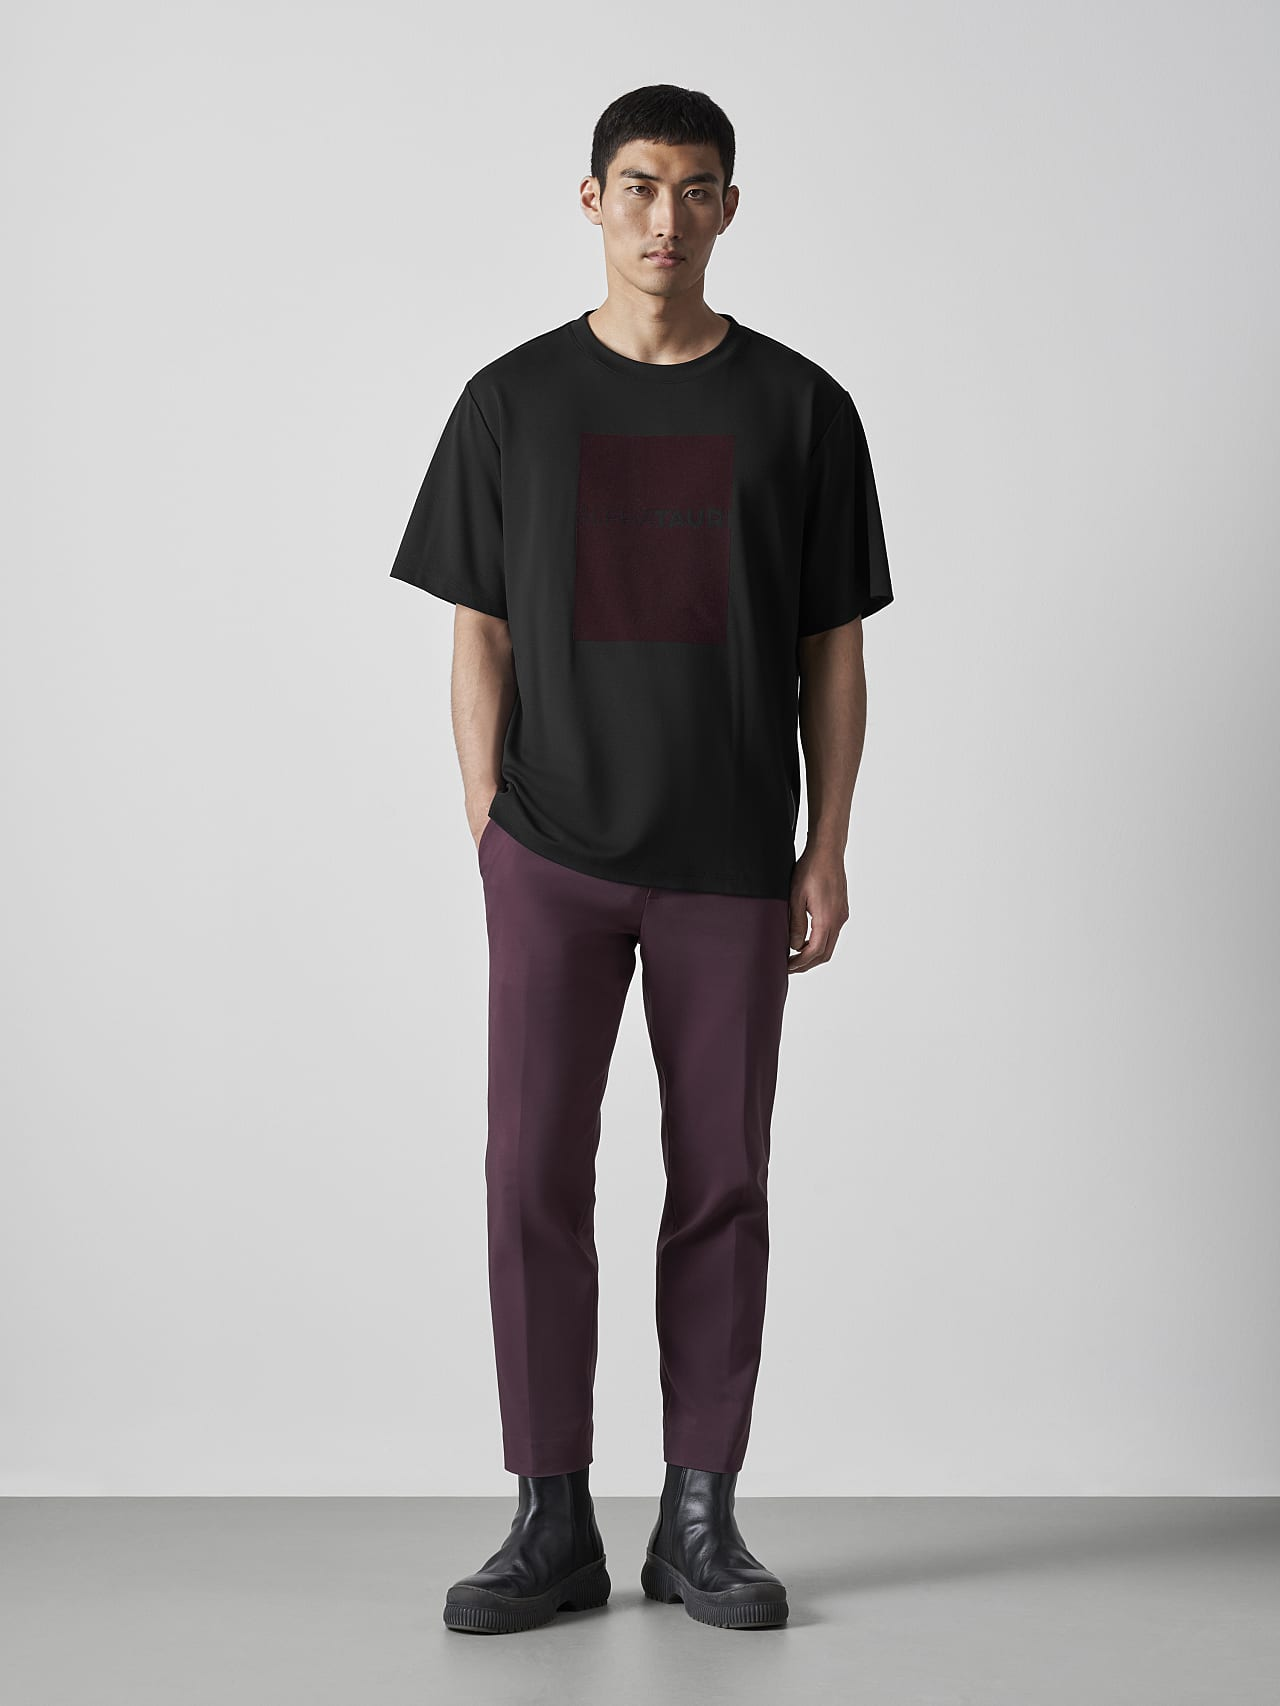 JAHEV V1.Y5.02 Relaxed Logo T-Shirt black Front Alpha Tauri